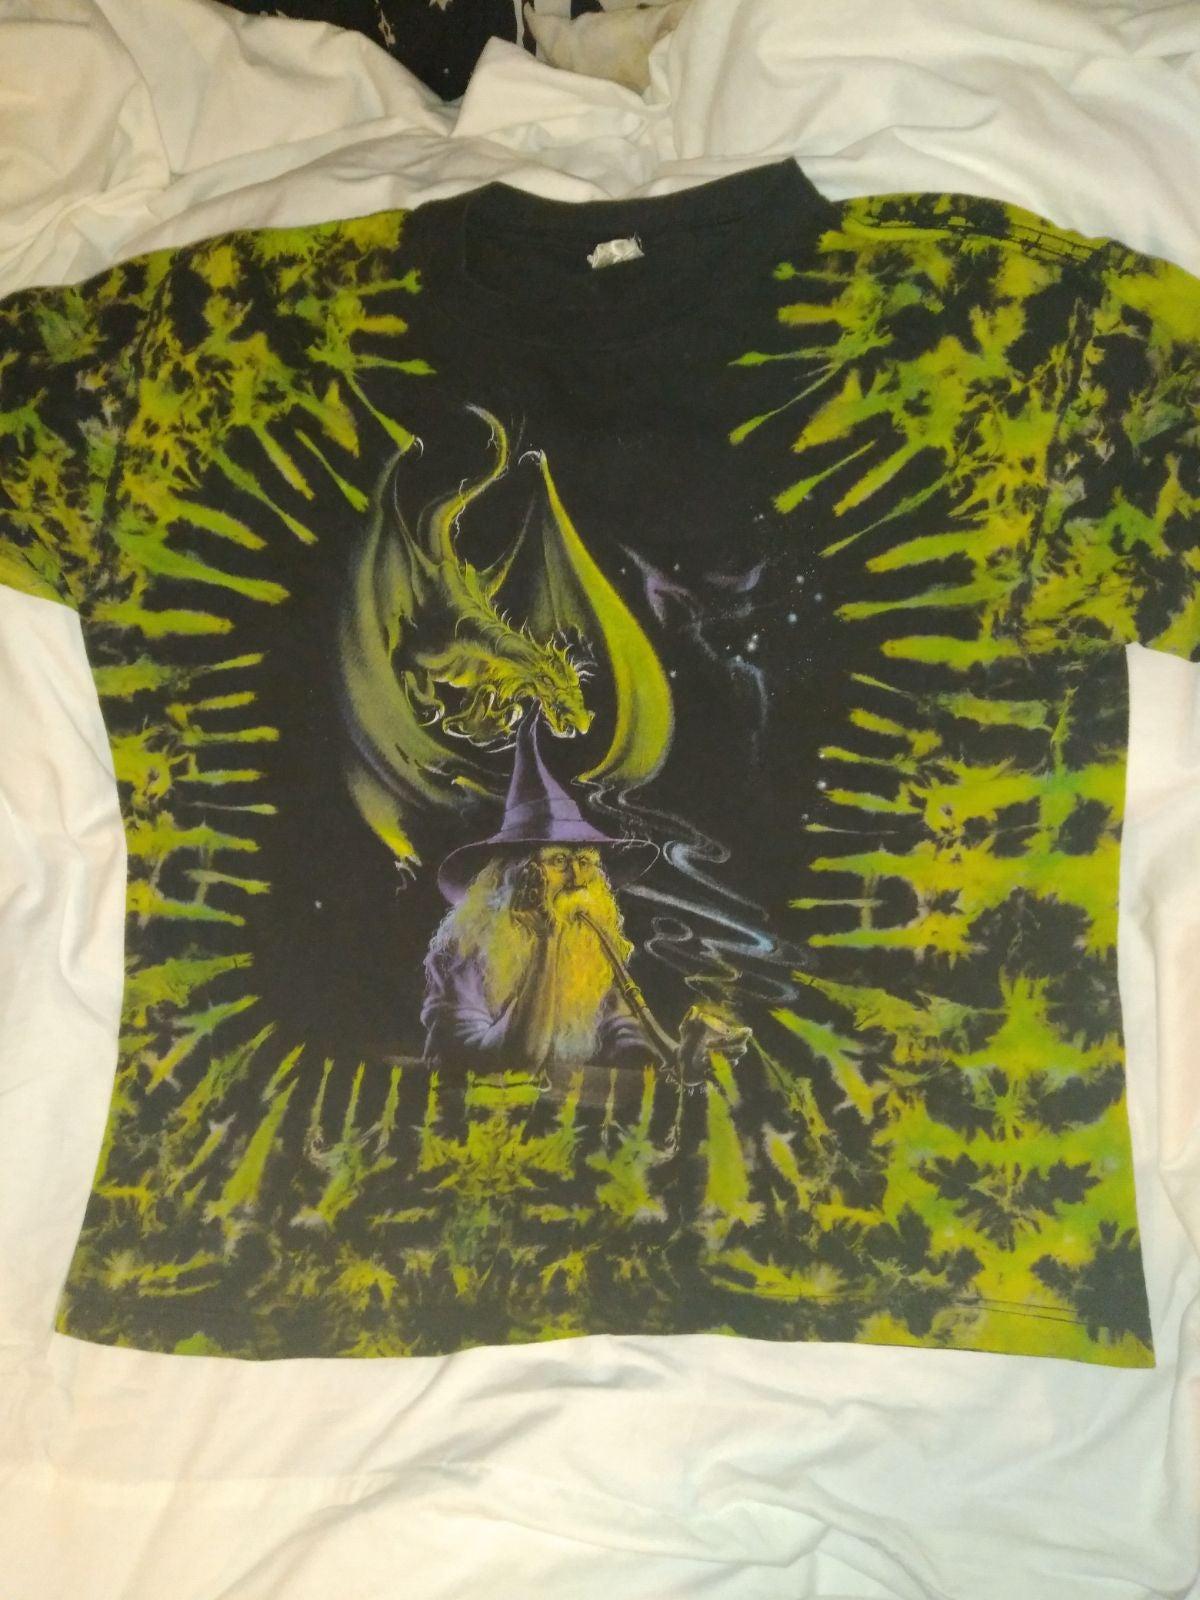 Tour champ vintage wizard shirt